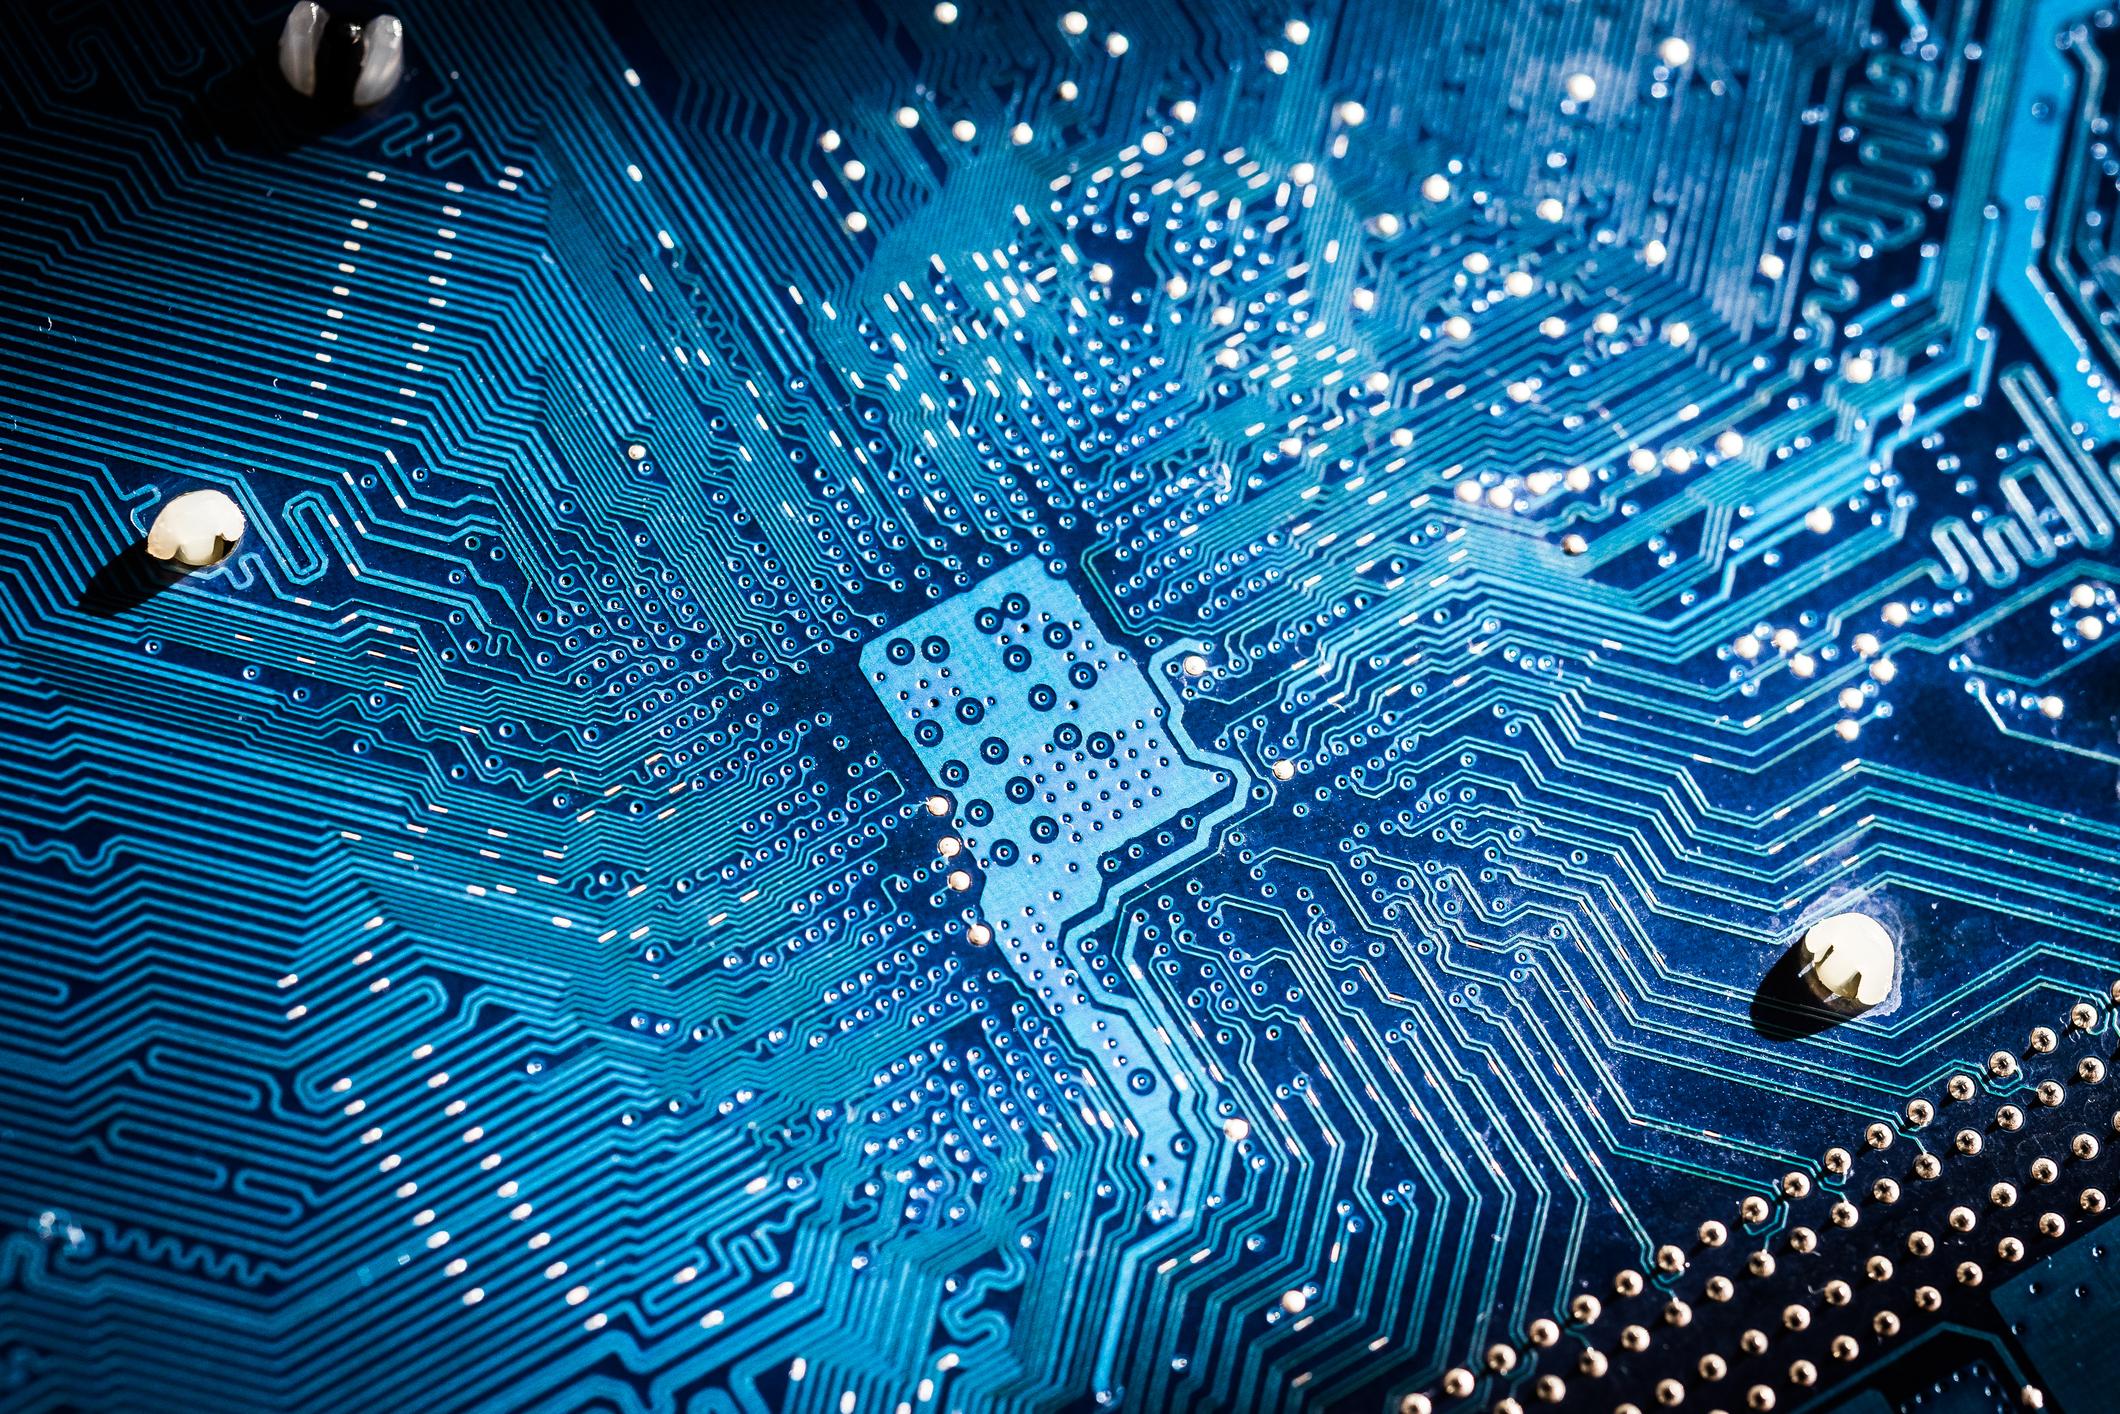 Circuit board under blue lights.